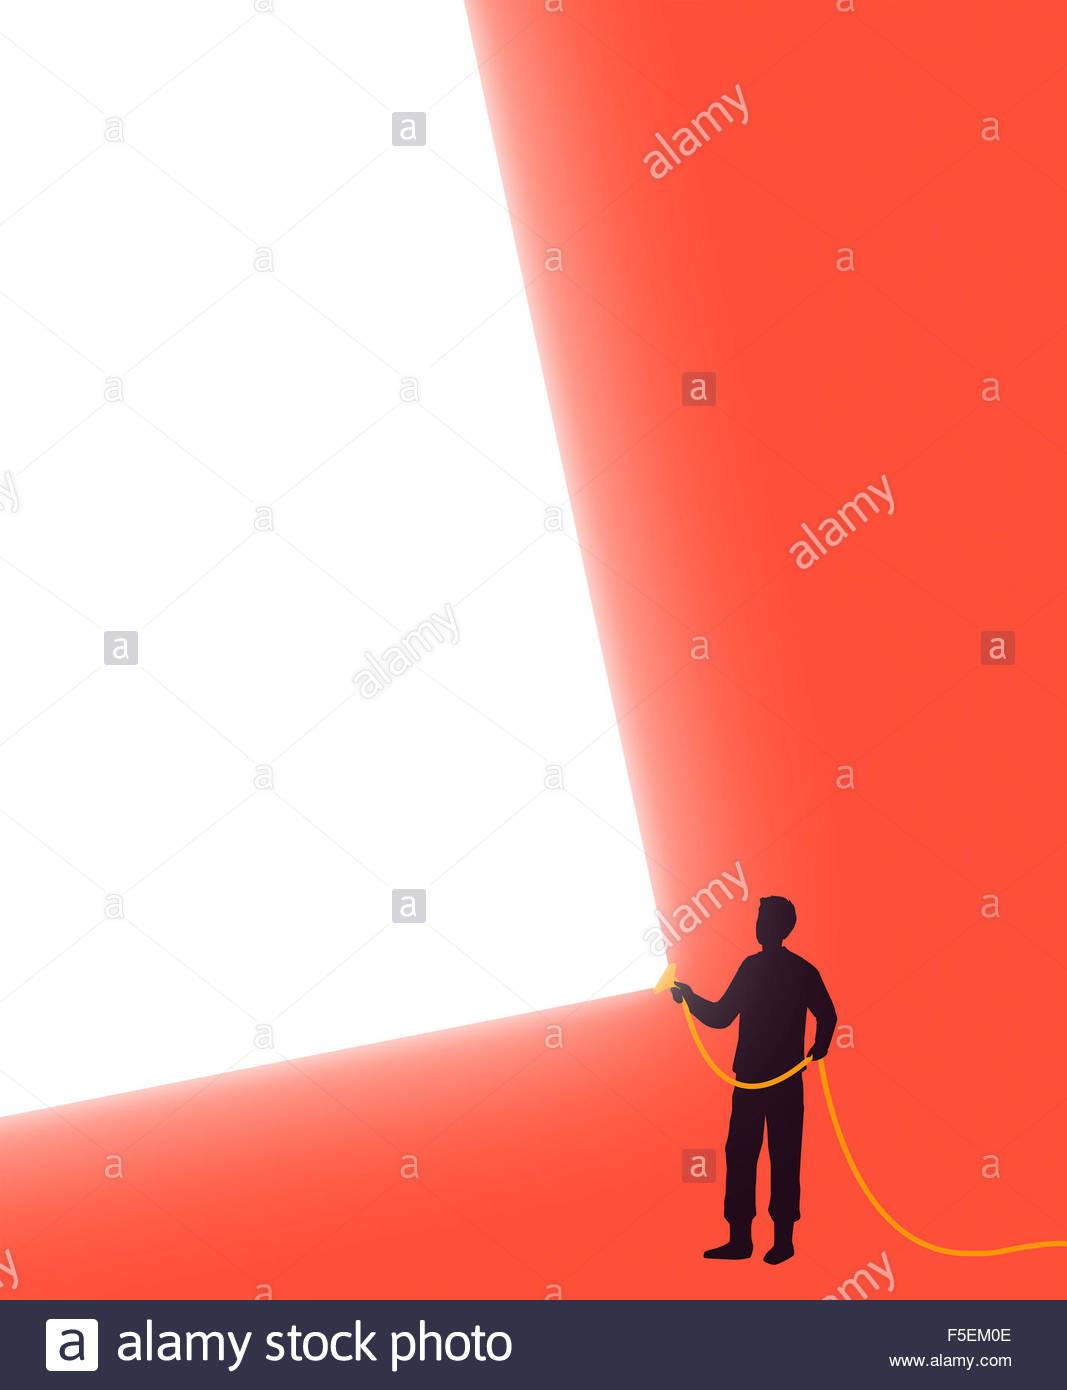 Man shining bright beam of light - Stock Image